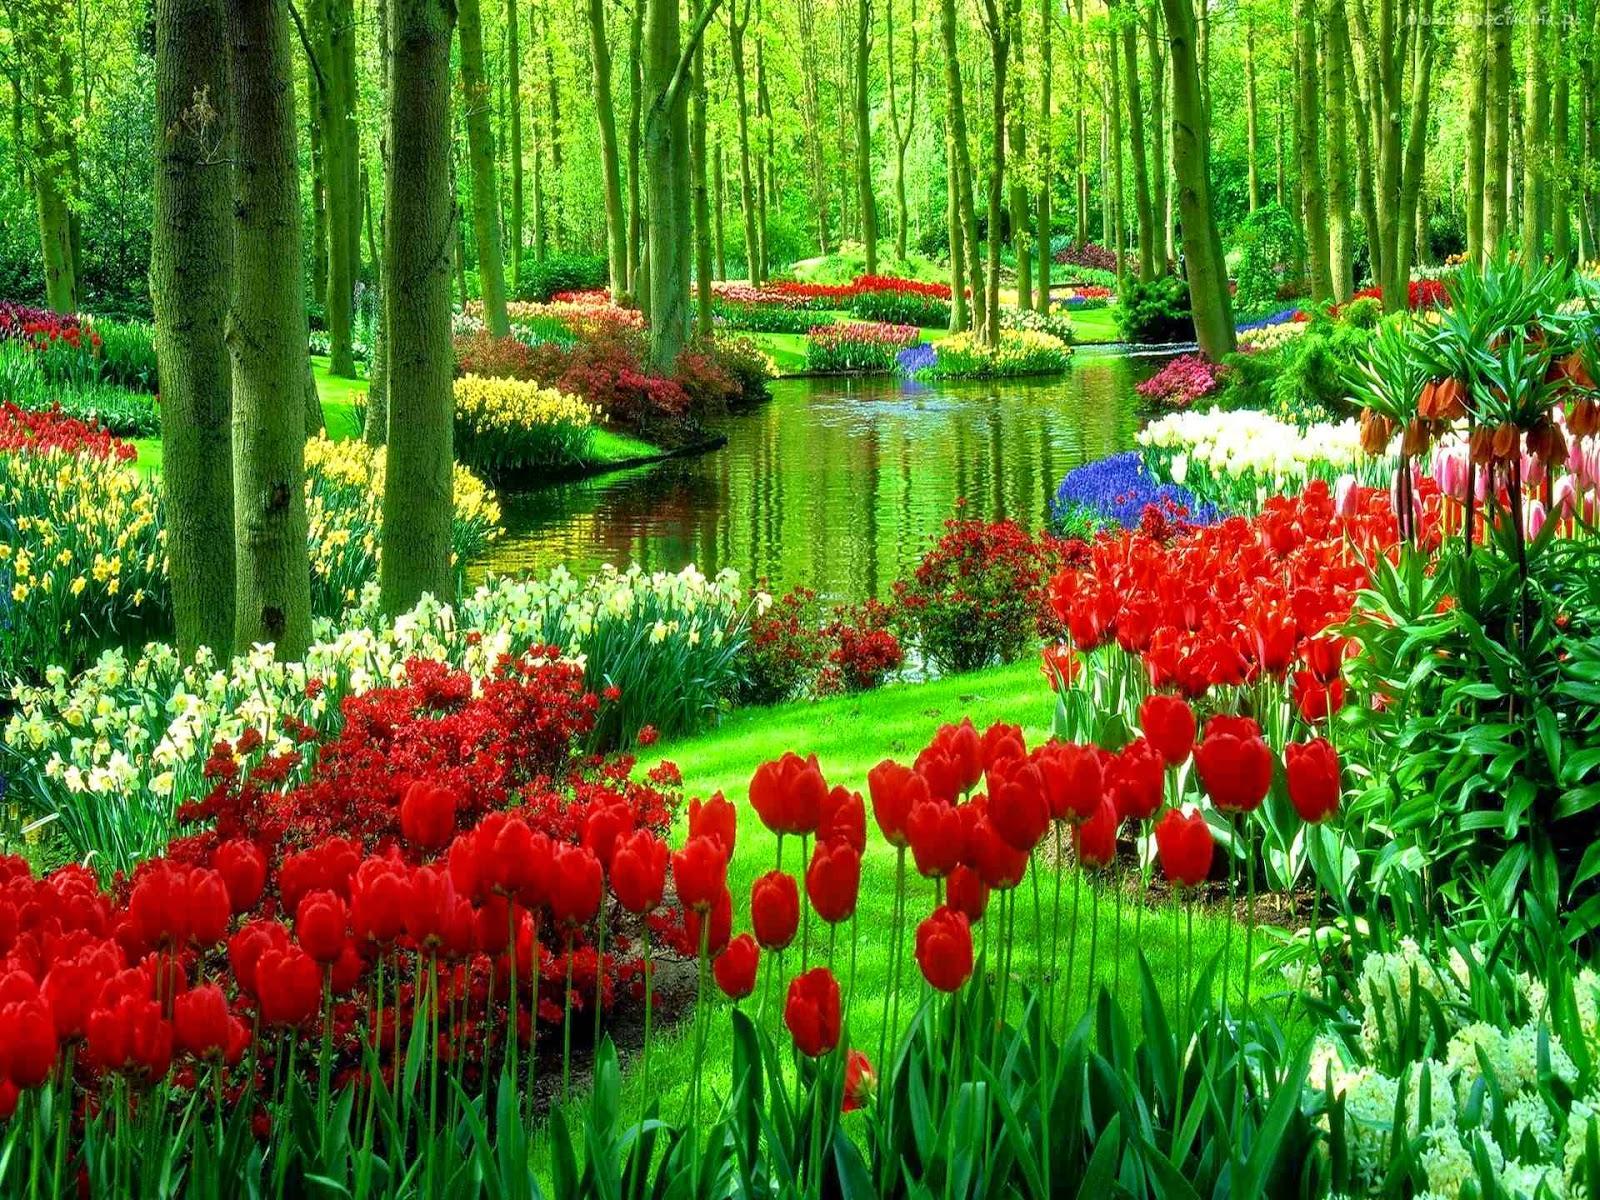 http://www.tapeciarnia.pl/138264_las_tulipany_woda.html